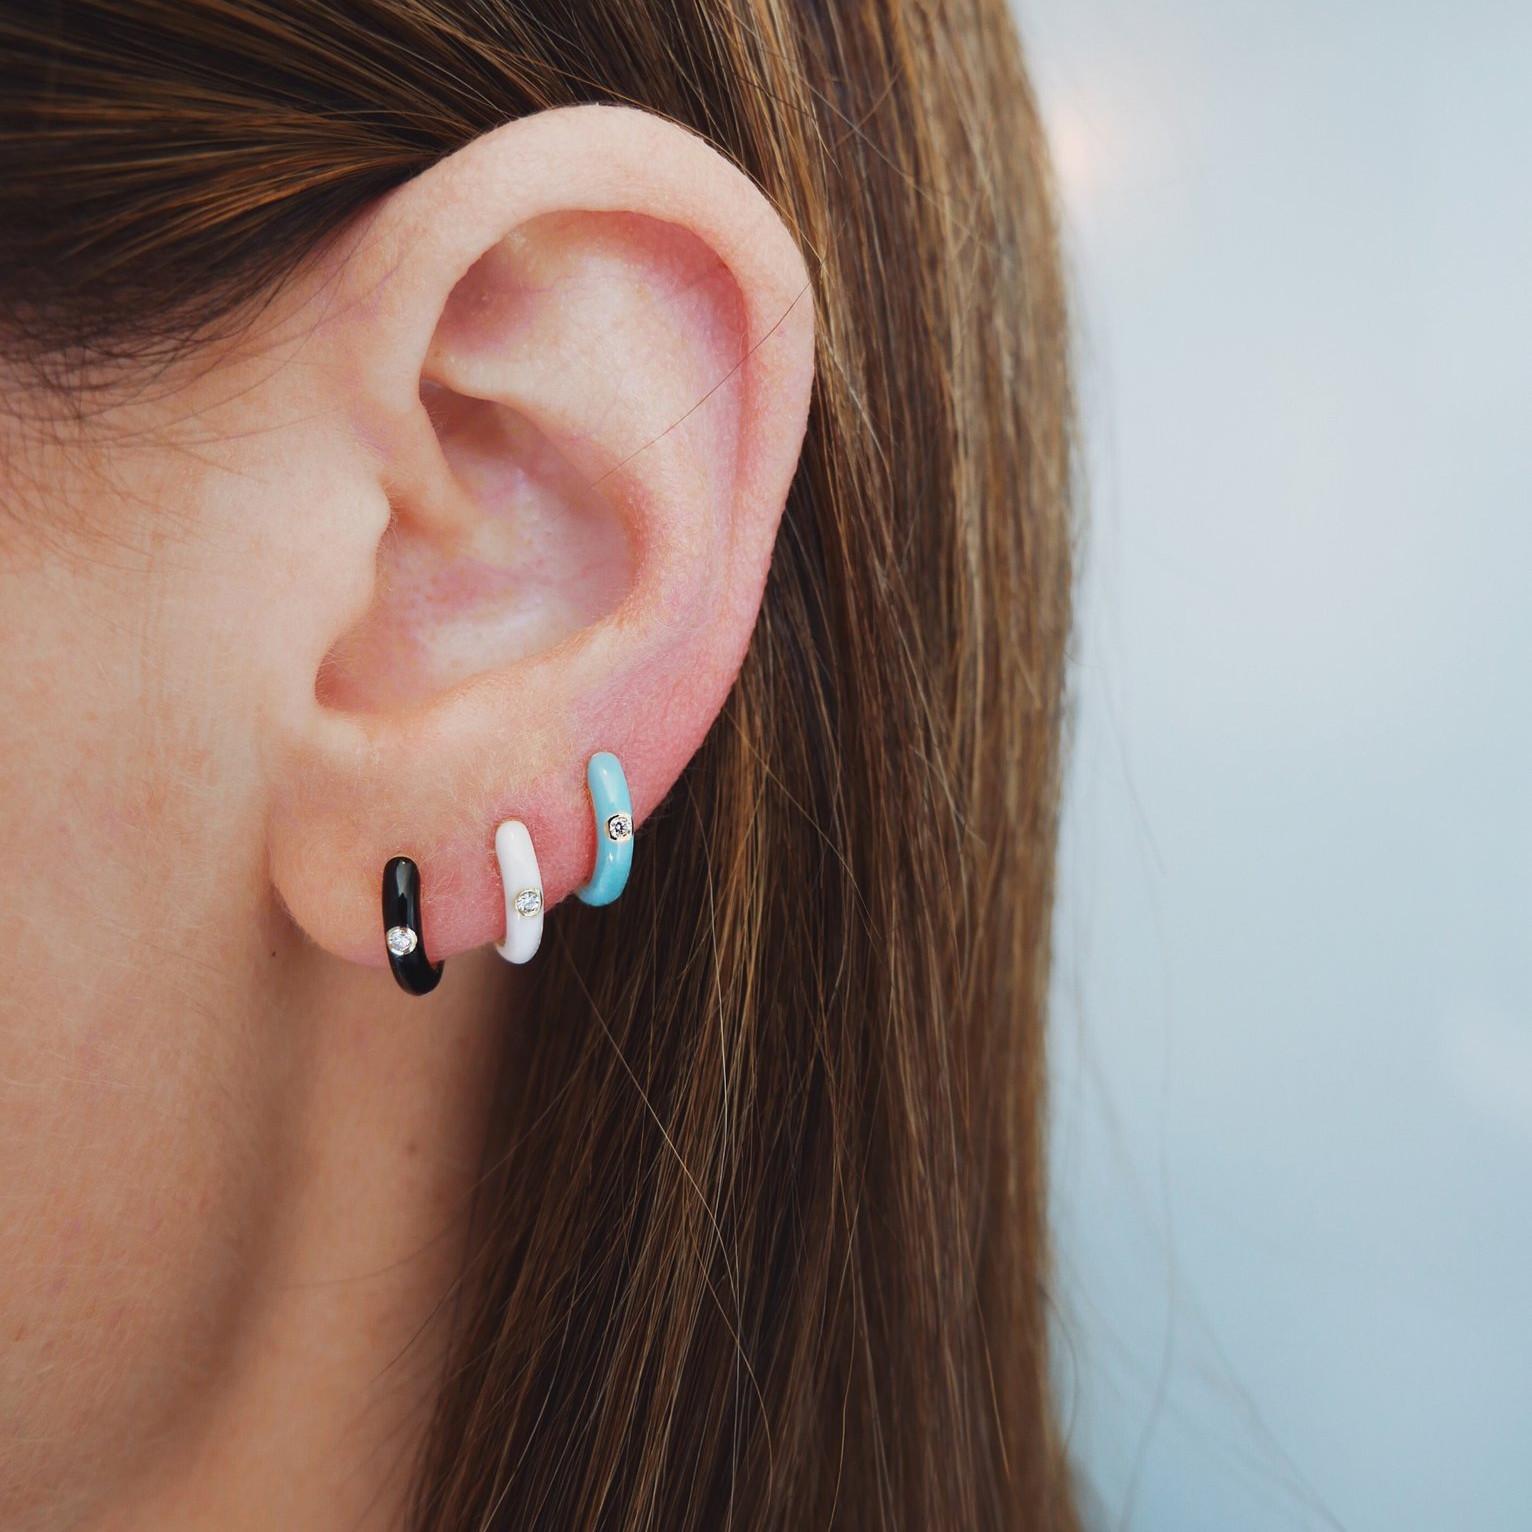 White Enamel & Diamond Huggie Earrings by EF Collection on Model